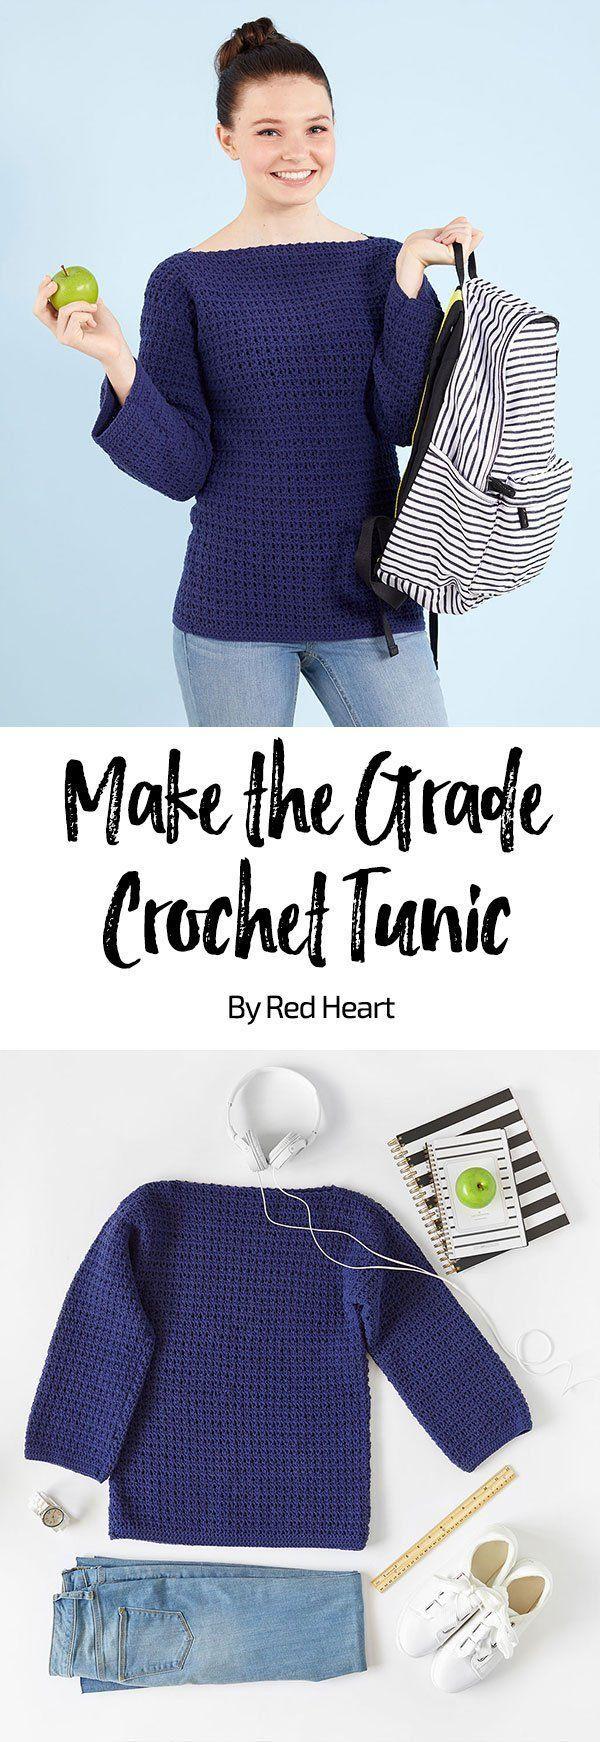 Make the Grade Crochet Tunic free crochet pattern in Amore yarn. This cozy sweat... - #Amigurumi #Amore #Cozy #crochet #free #Grade #pattern #sweat #tunic #yarn